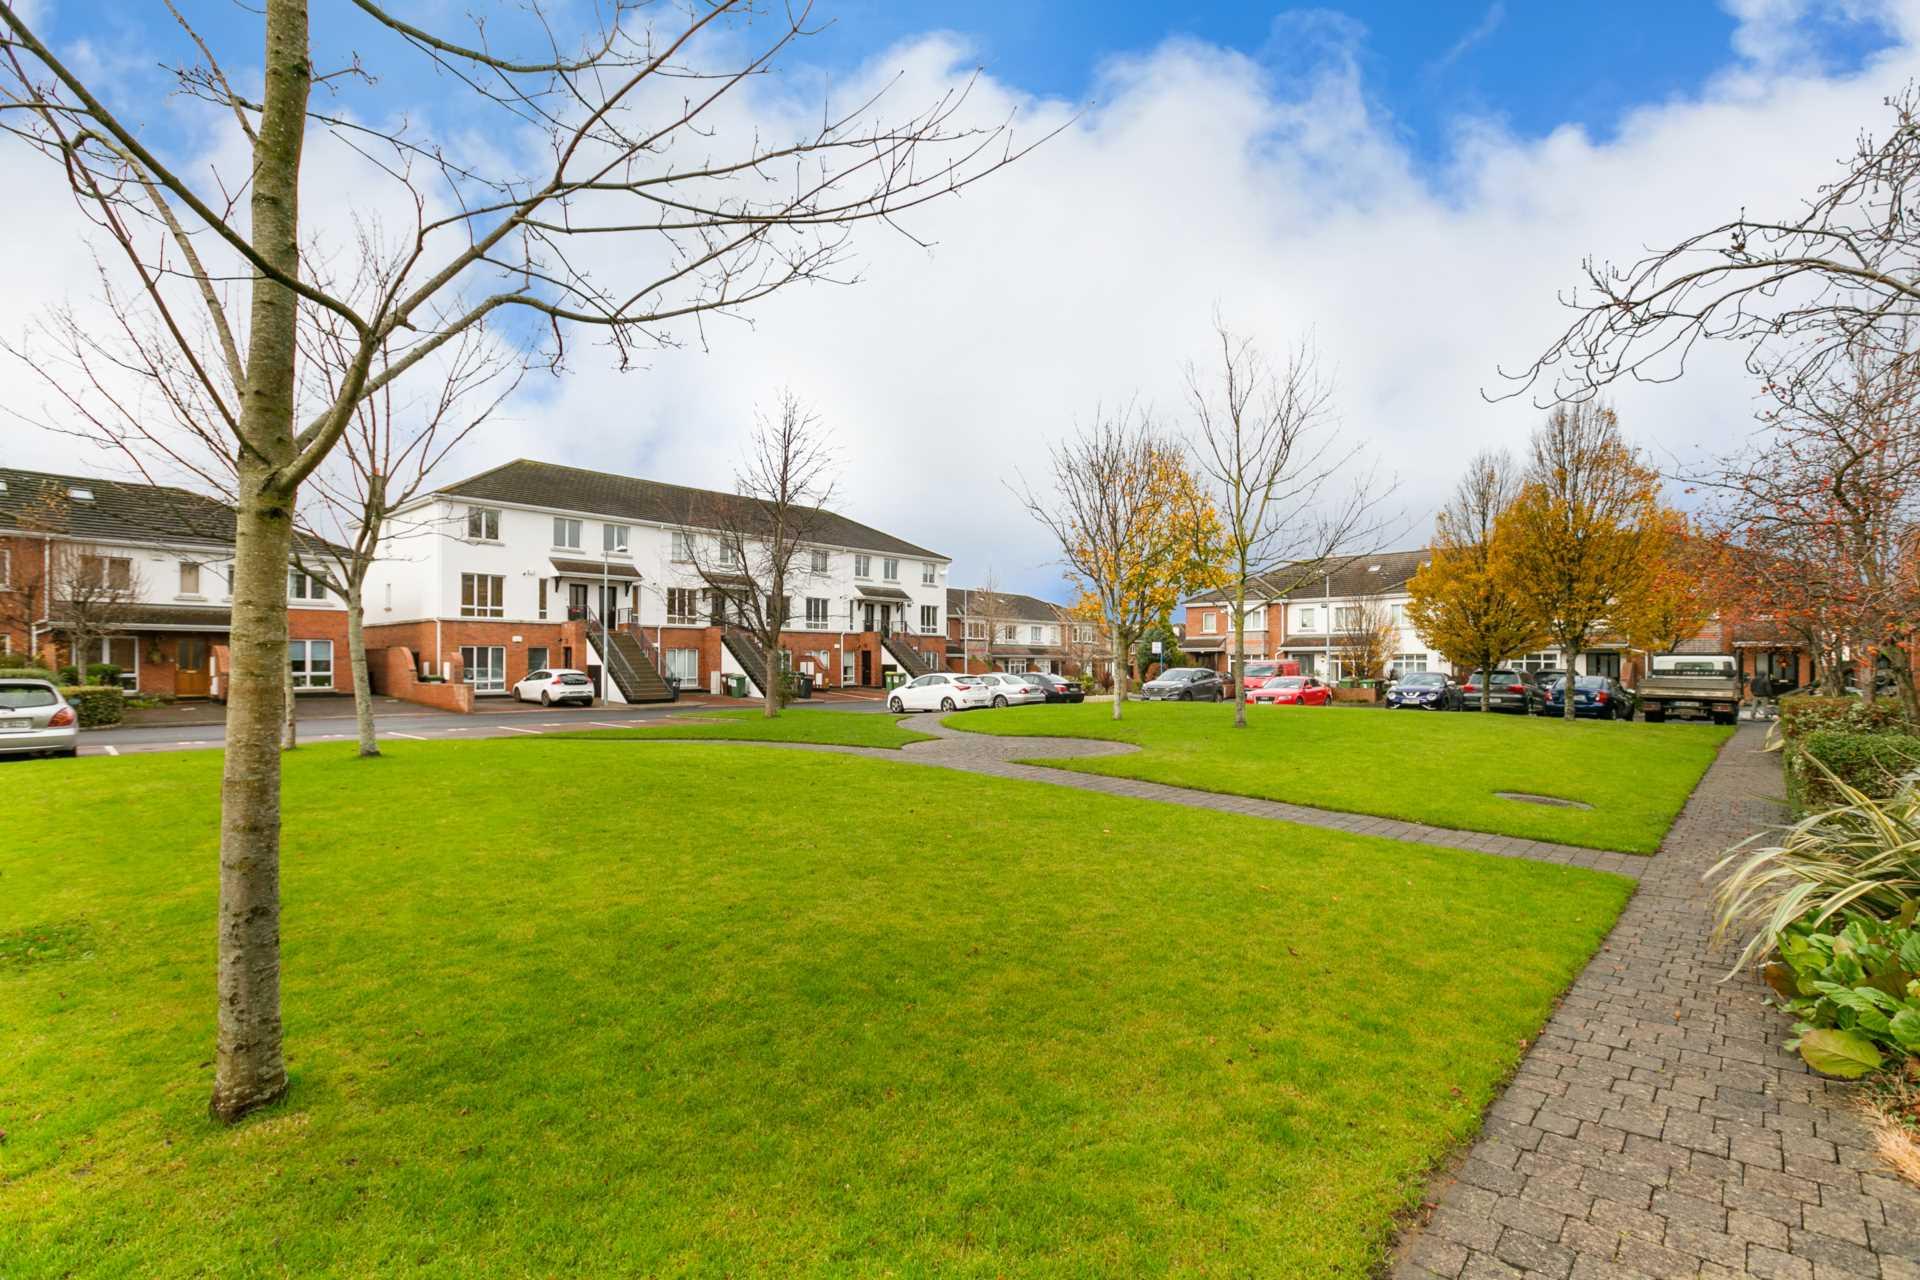 20 Kilvere Park, Cypress Downs, Templeogue, Dublin 6W, Image 15